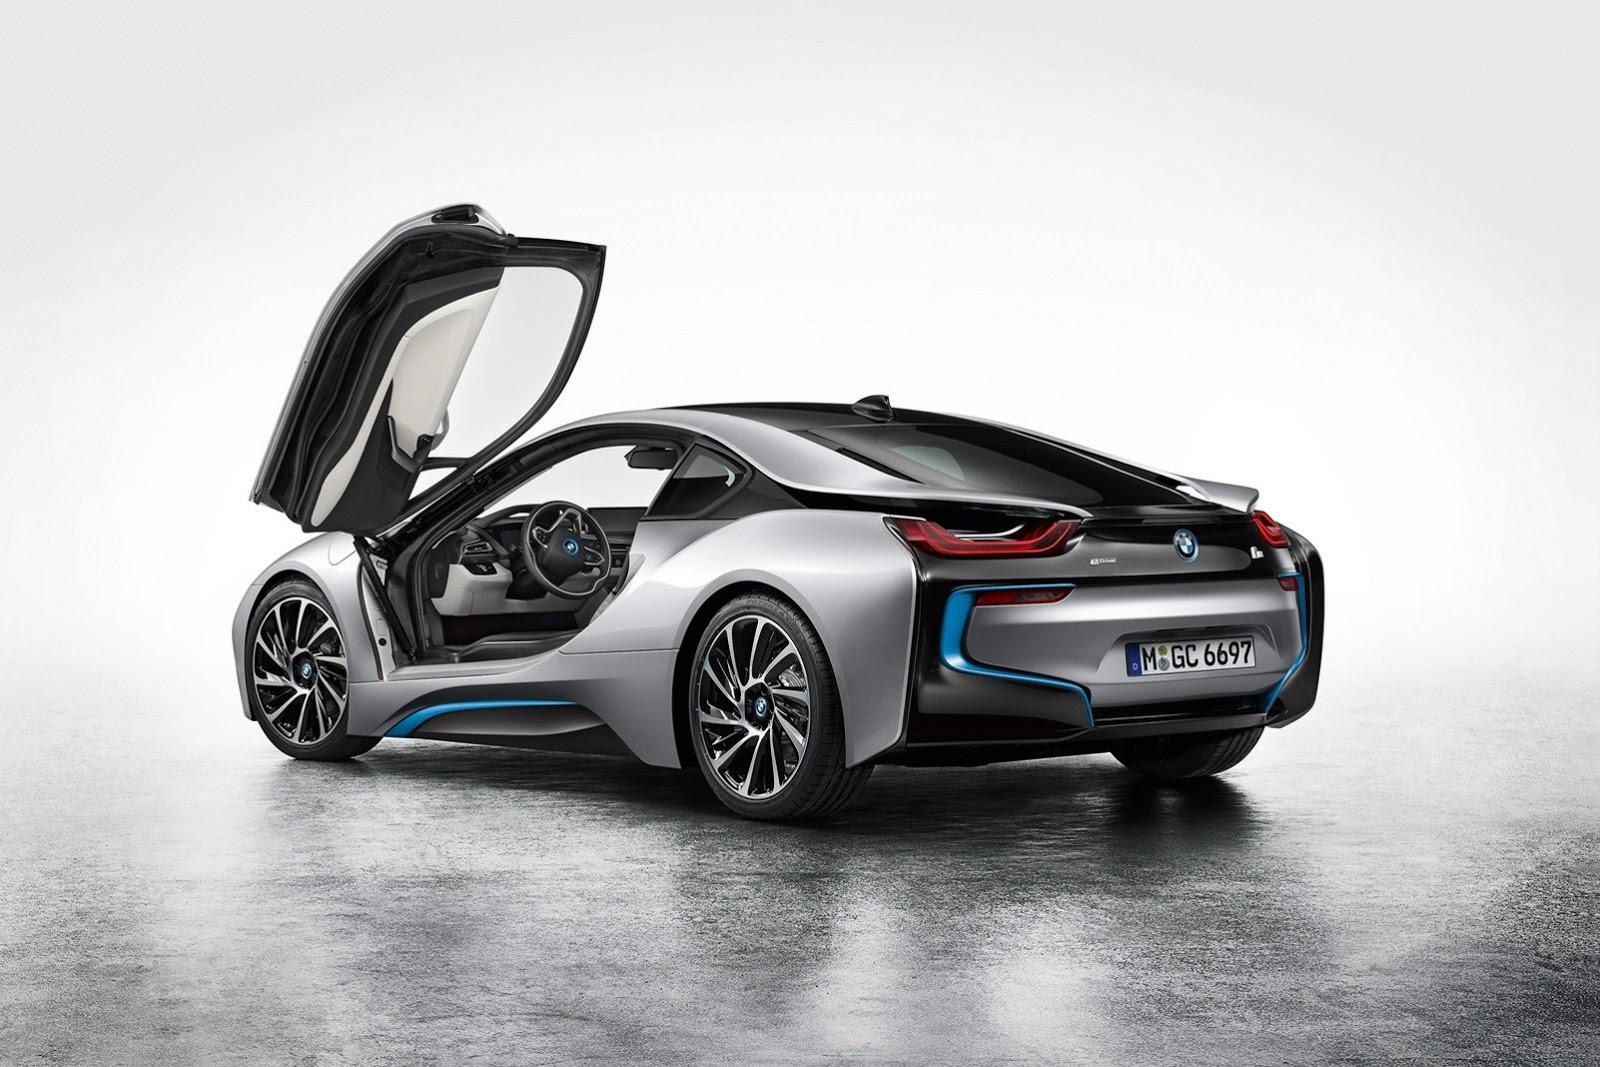 new bmw i8 hybrid sports car priced from  135 700 in u s